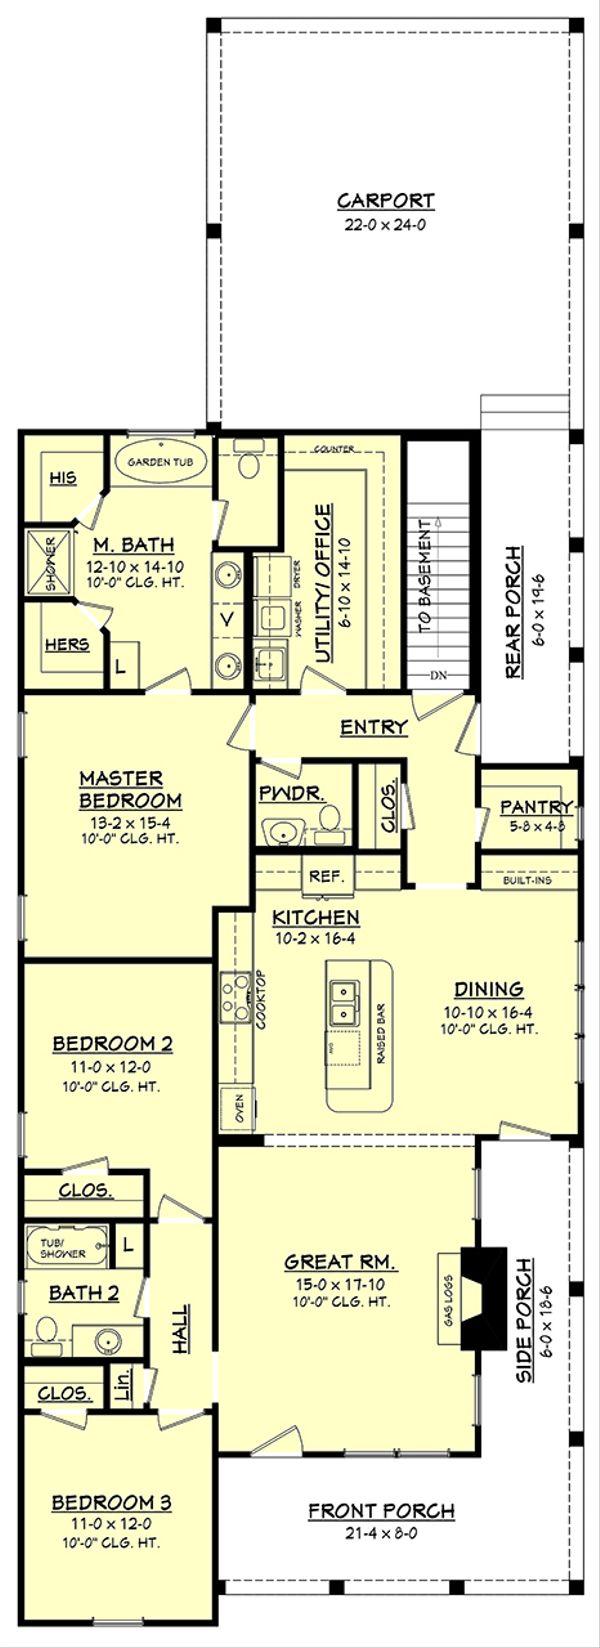 House Plan Design - Main Level w/ opt. basement stair